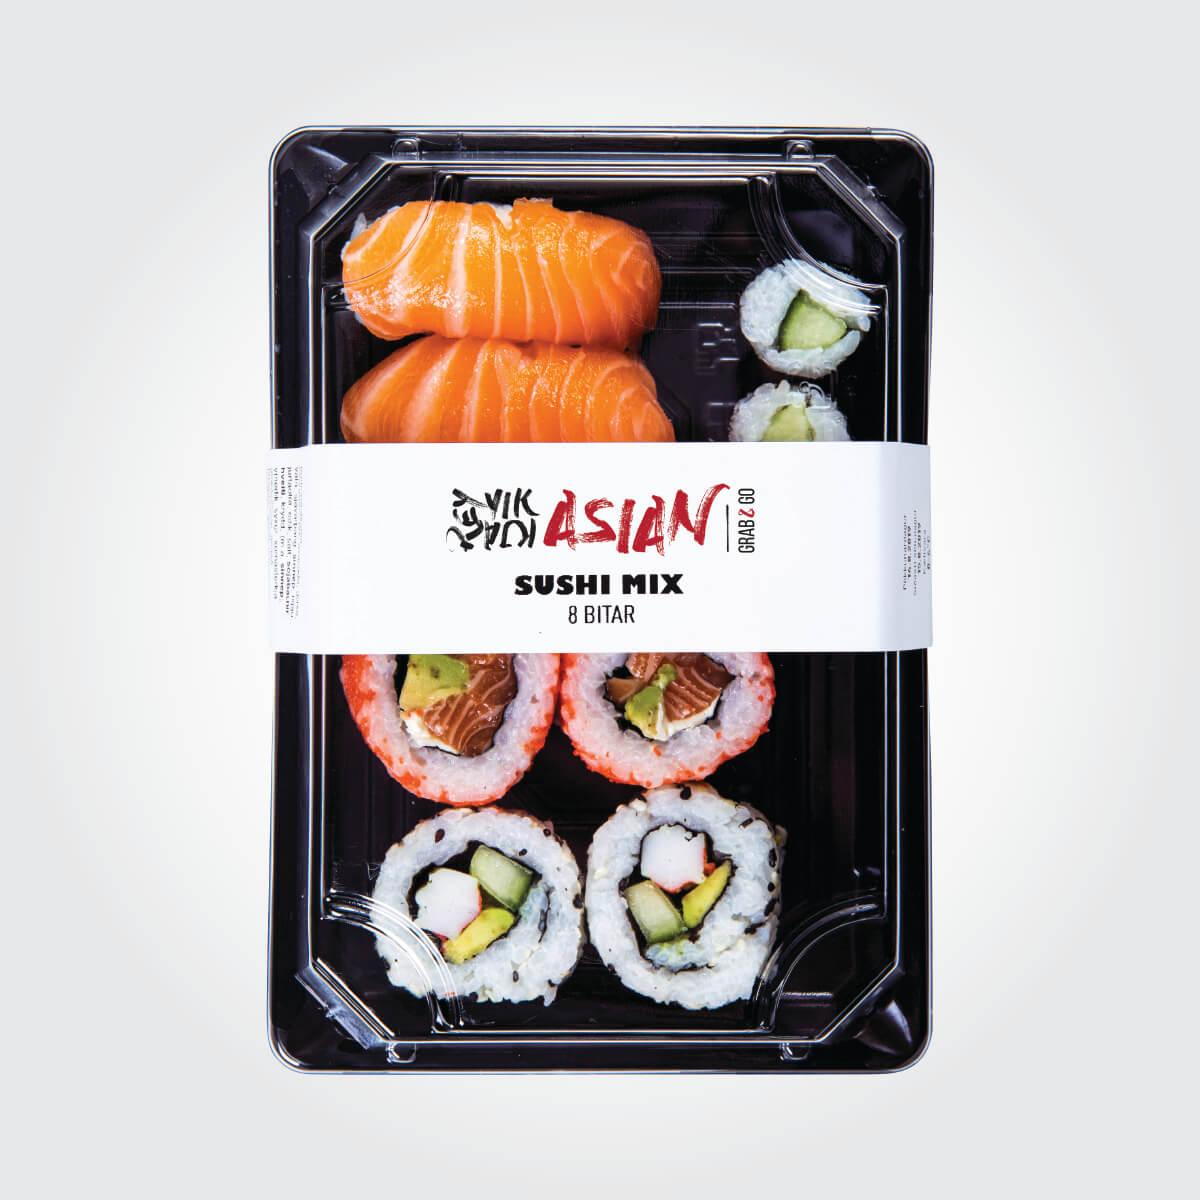 Sushi Mix - 8 bitar - Reykjavík Asian